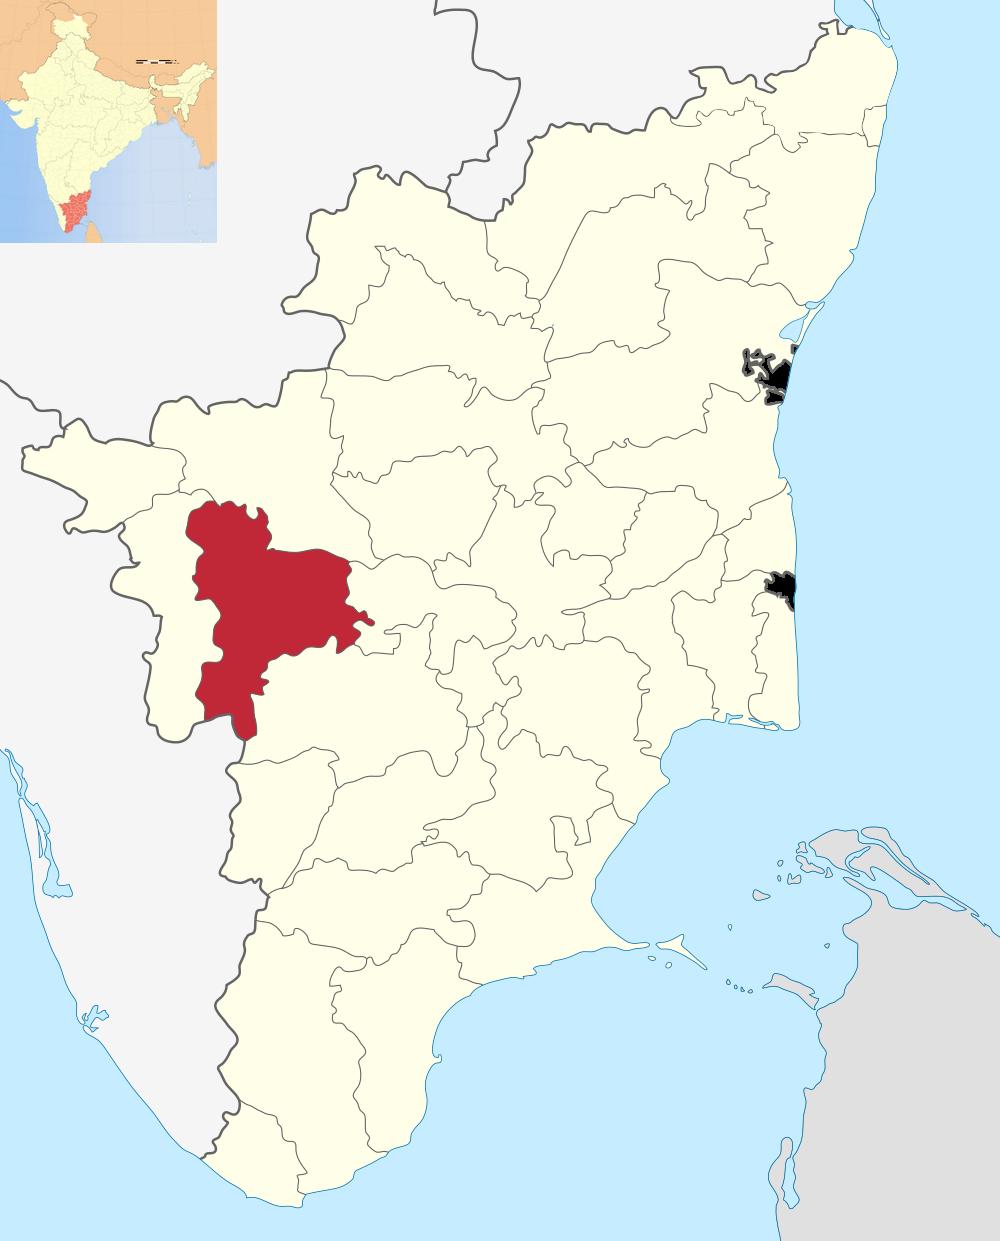 tiruppur hindu personals Hindu temples in tiruppur agaramsiththar padmanapan 142 ranganathapuram 4th st nrk puram tk colony tiruppur tamil nadu 641607 india phone: 096000 04211.